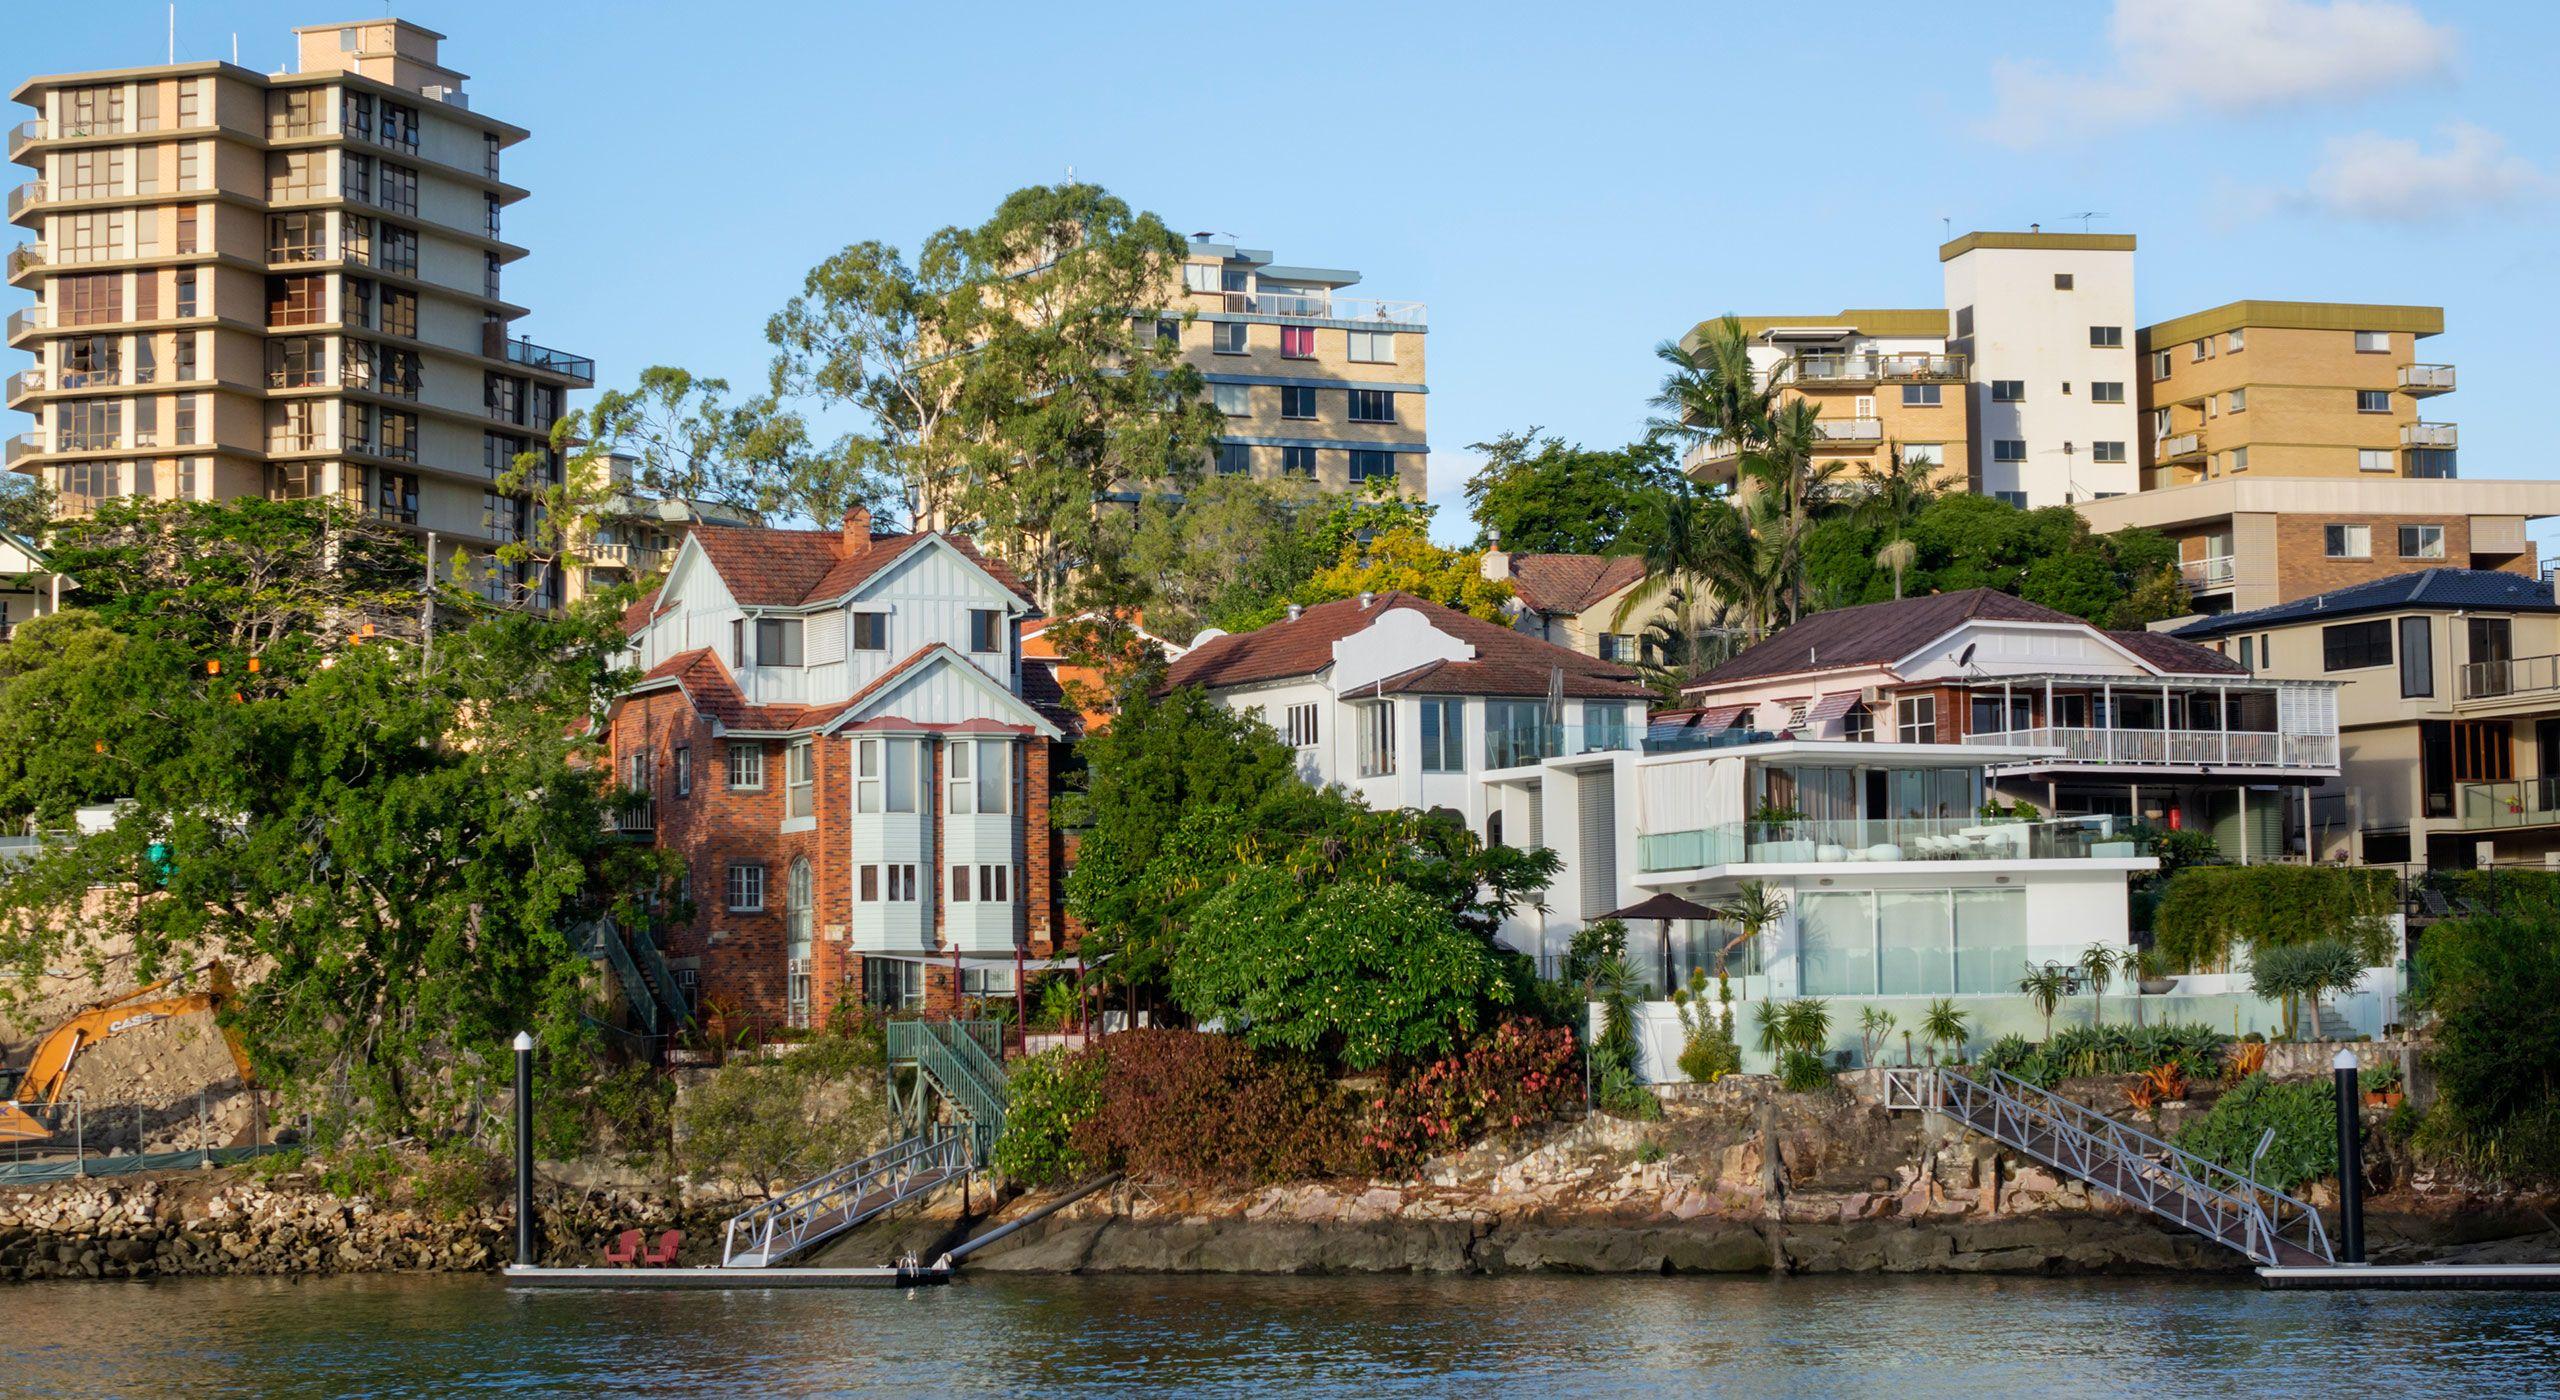 Brisbane Inbody1 2560x1400